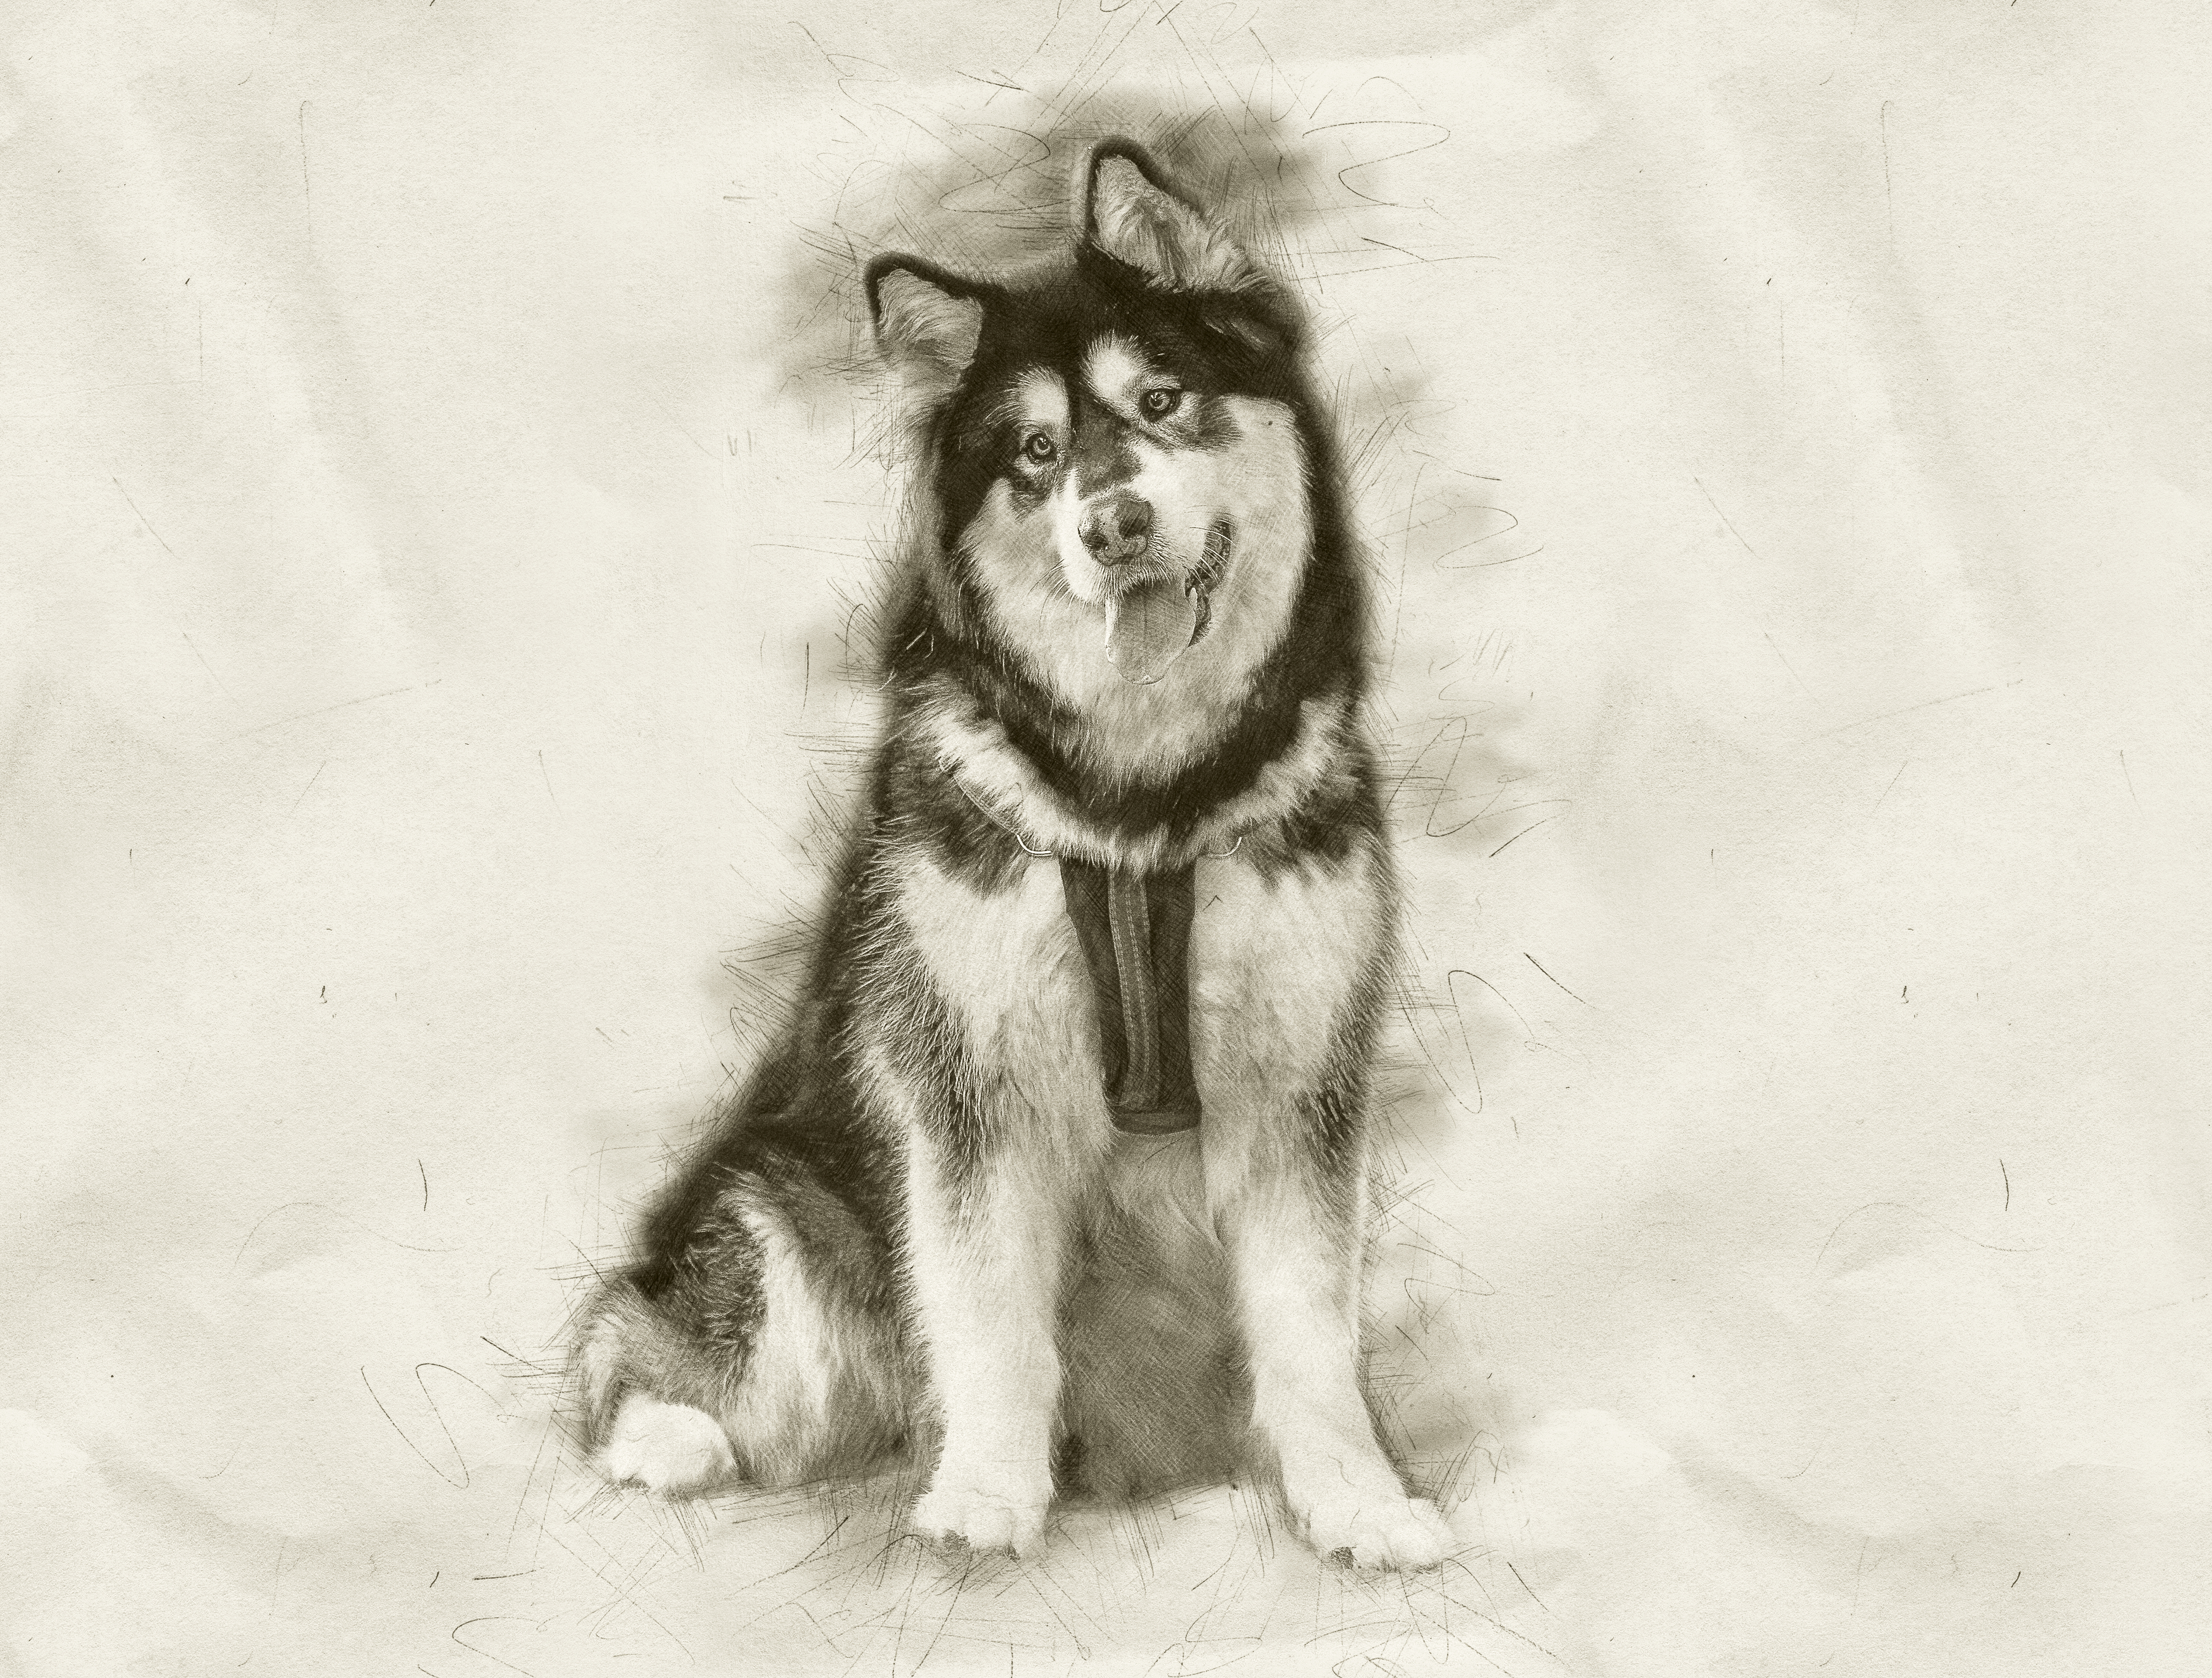 B&W Sketch